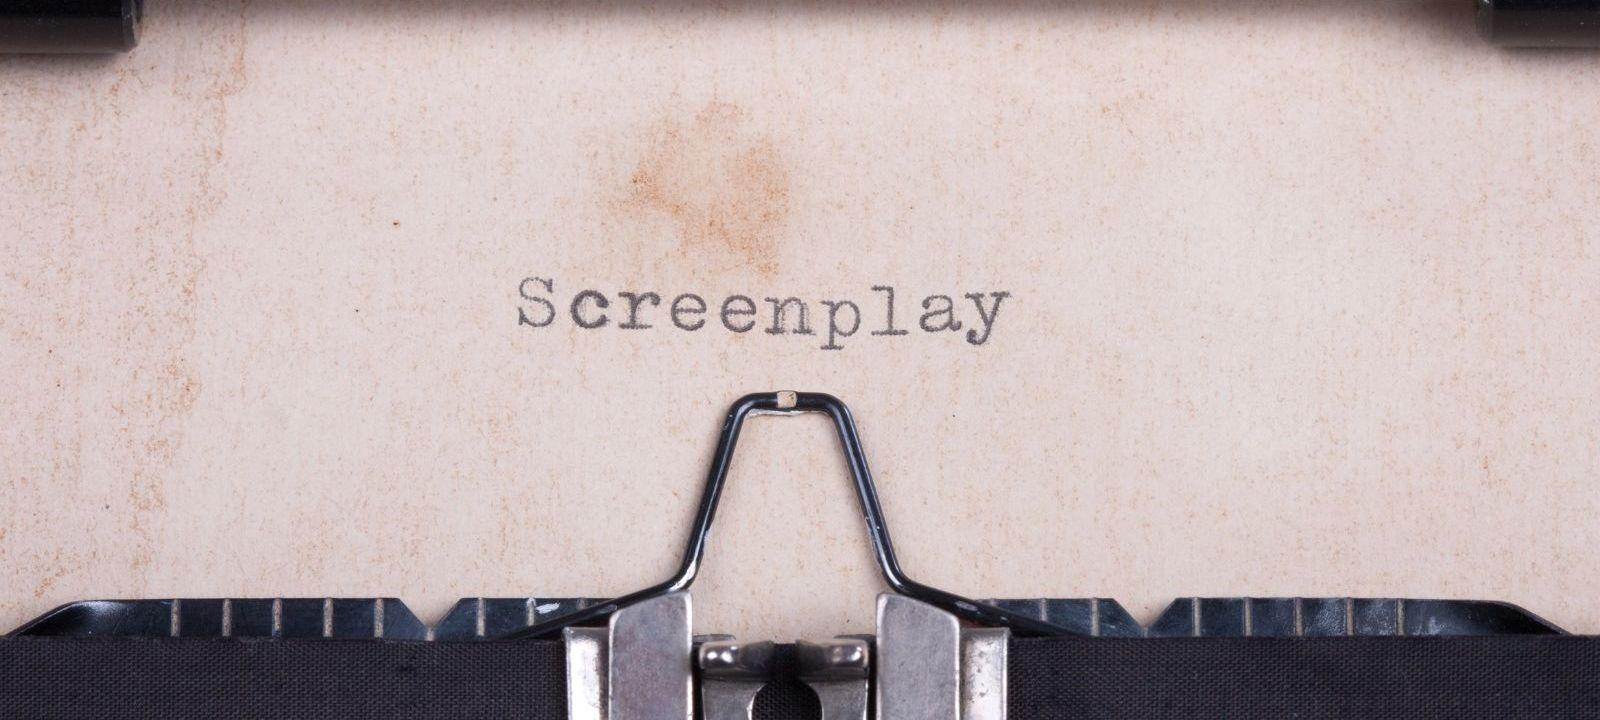 convocatorias mujeres guion